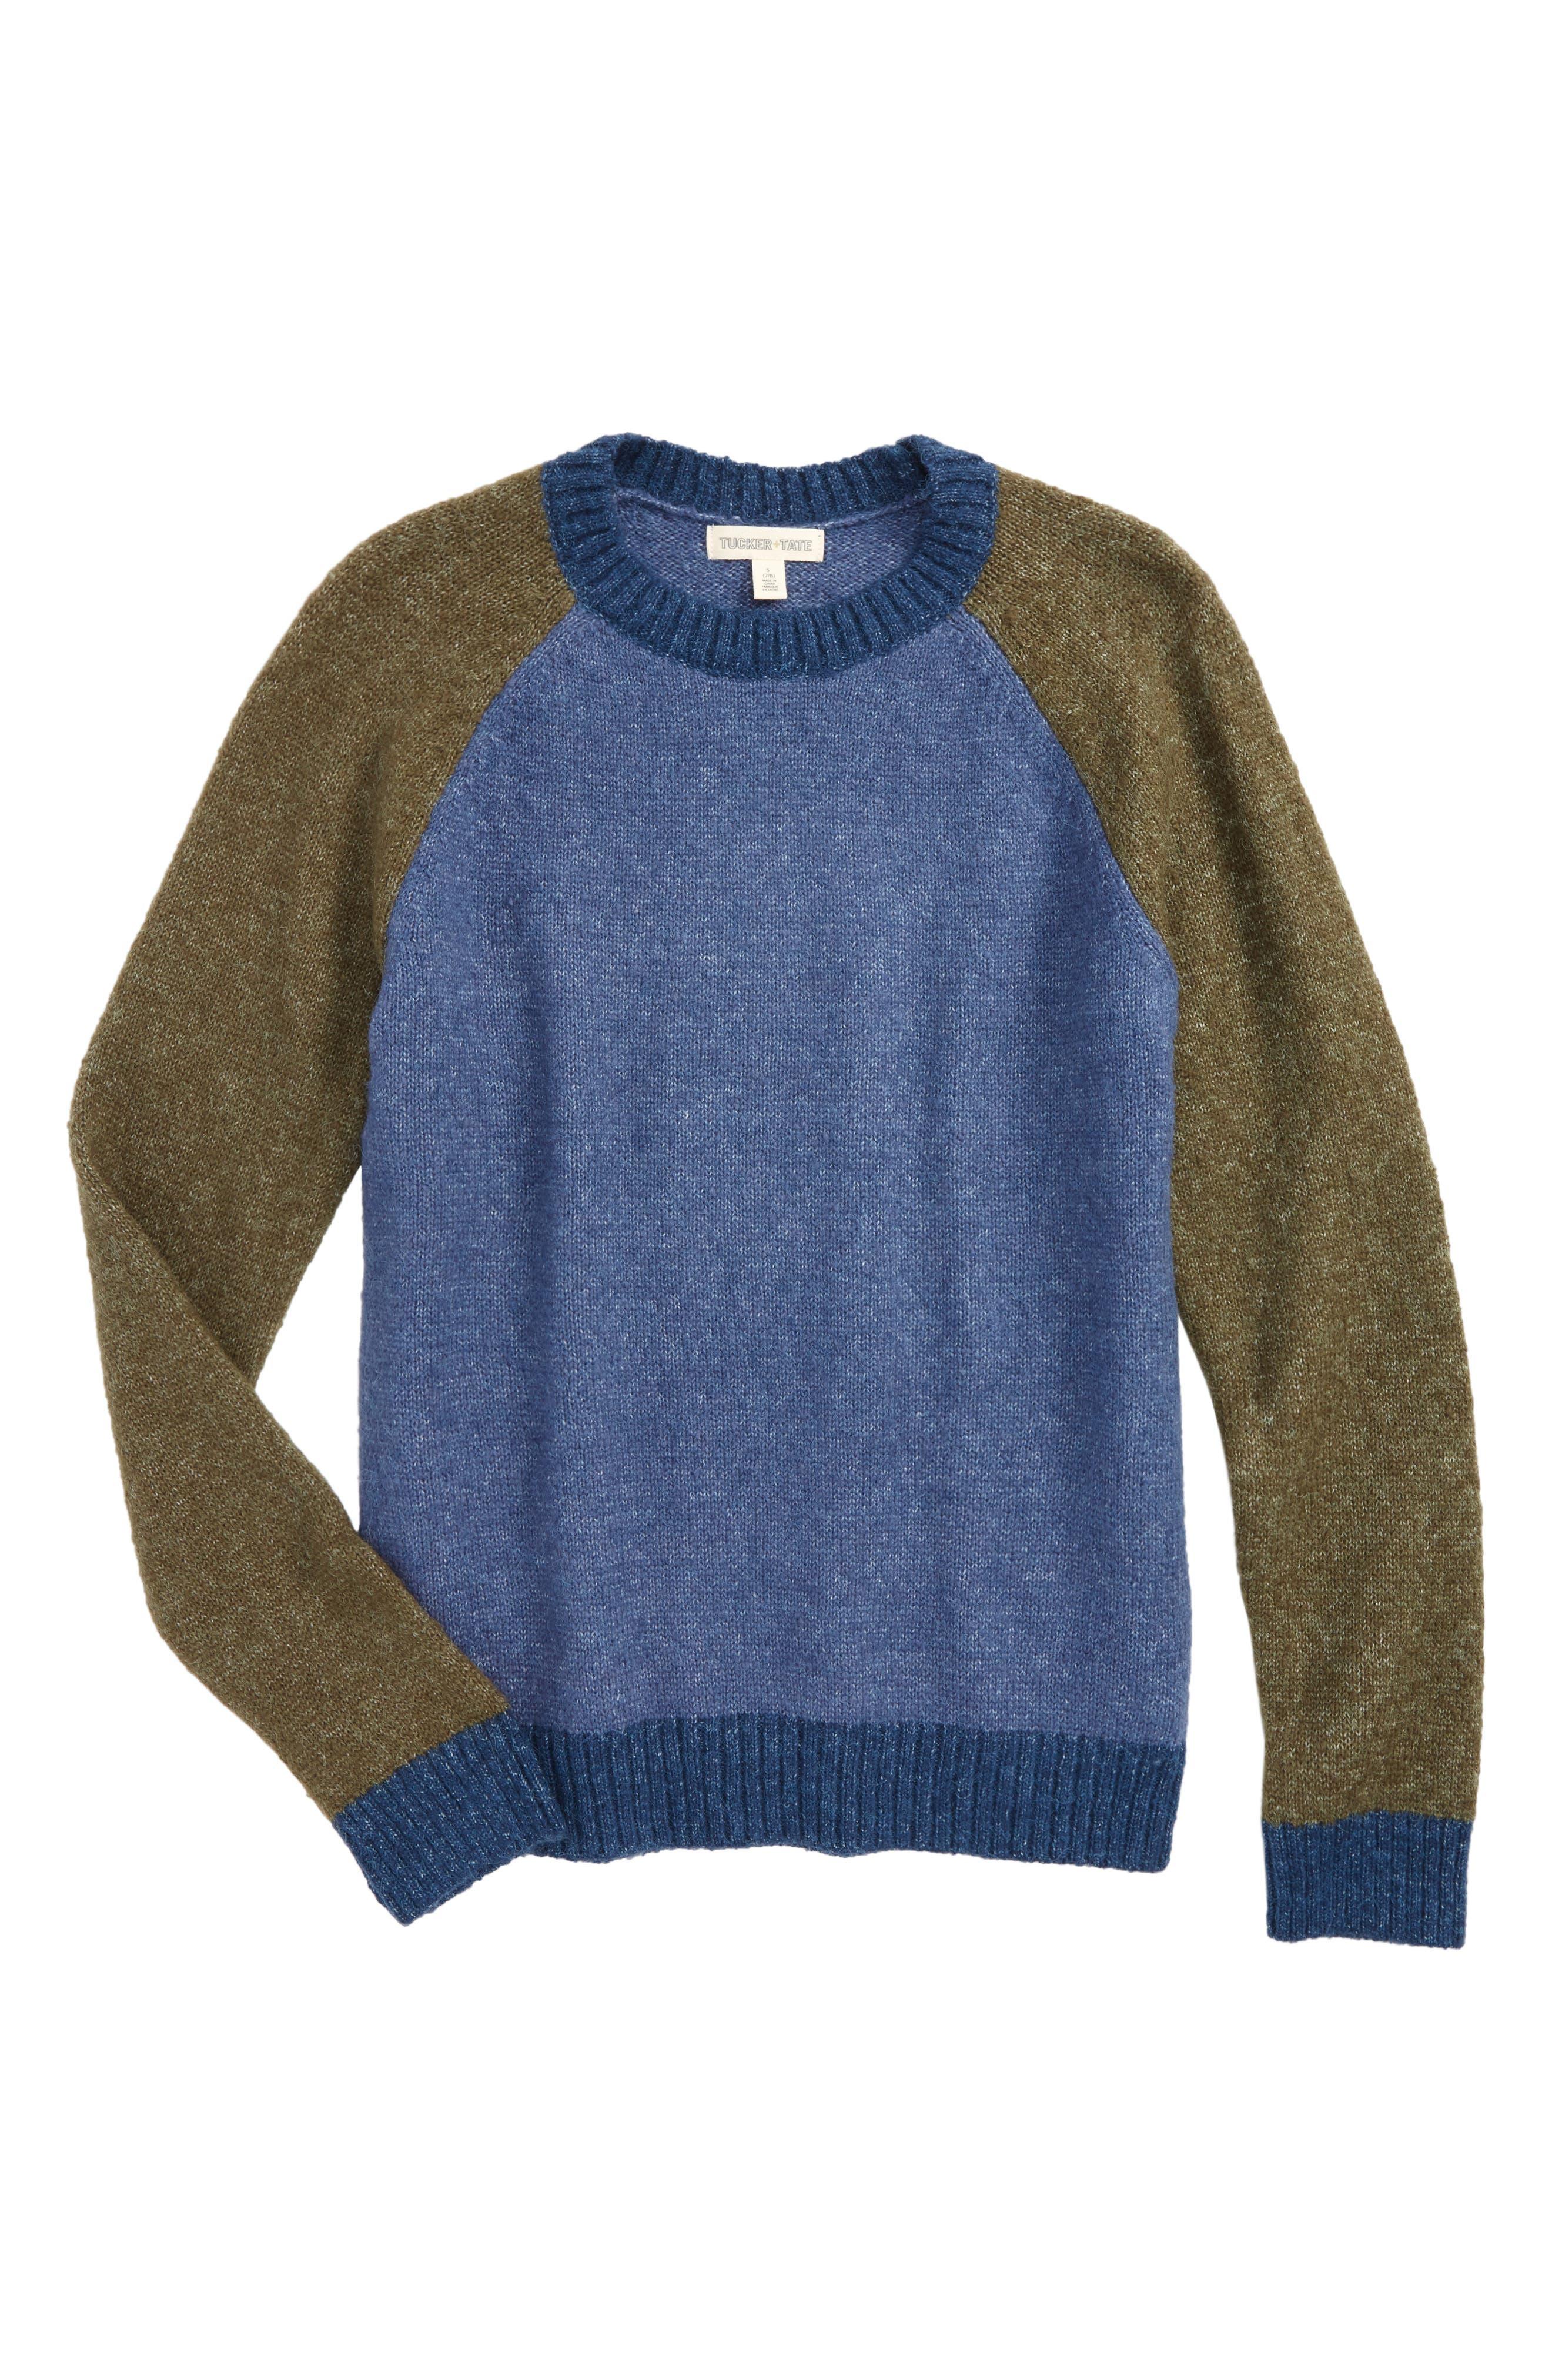 Colorblock Knit Sweater,                         Main,                         color, 420